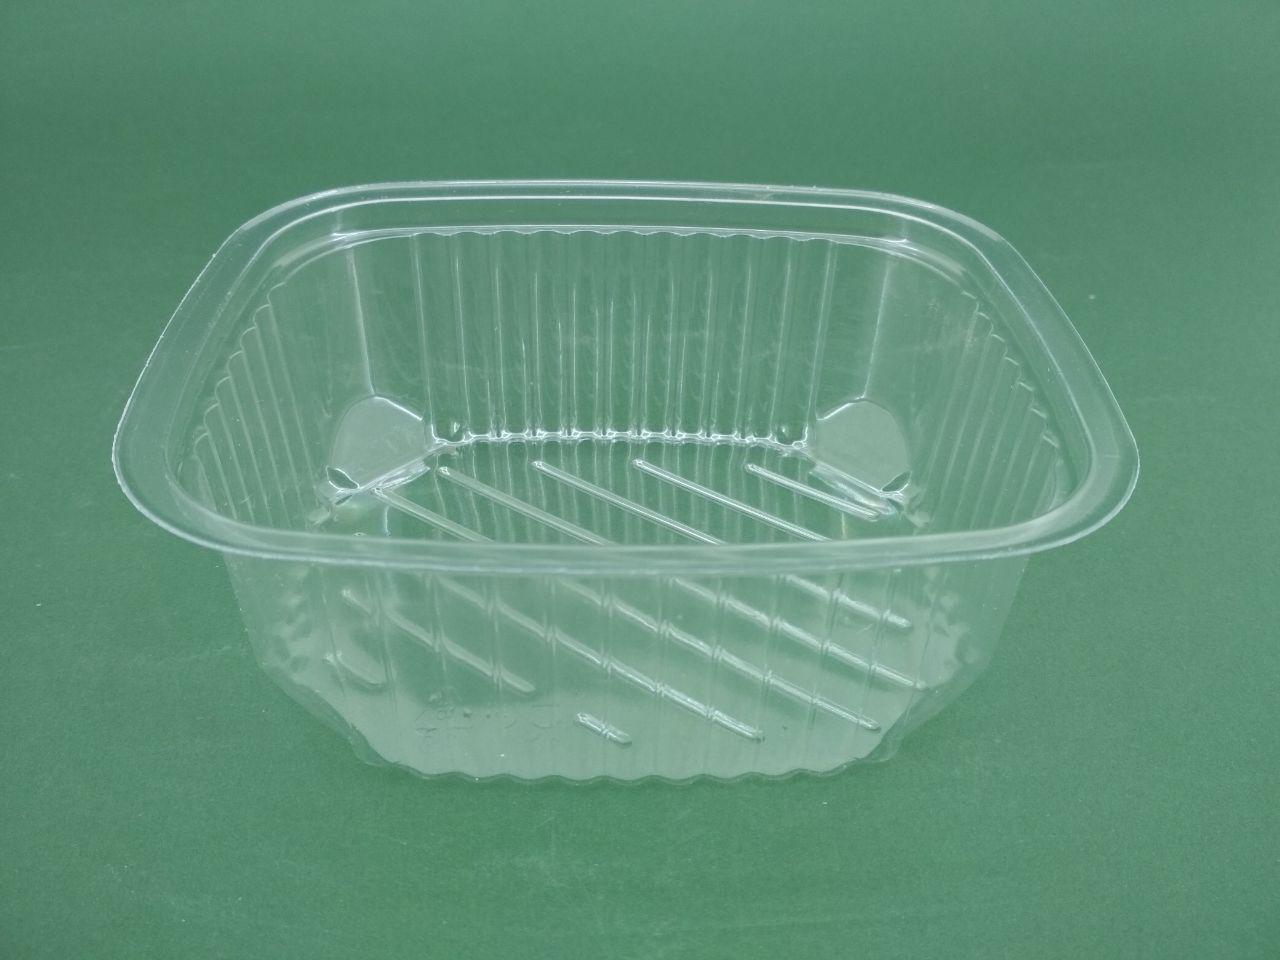 Упаковка блистерная контейнер  SL800L (V500мл\внутр\разм143*117*54) (50 шт)